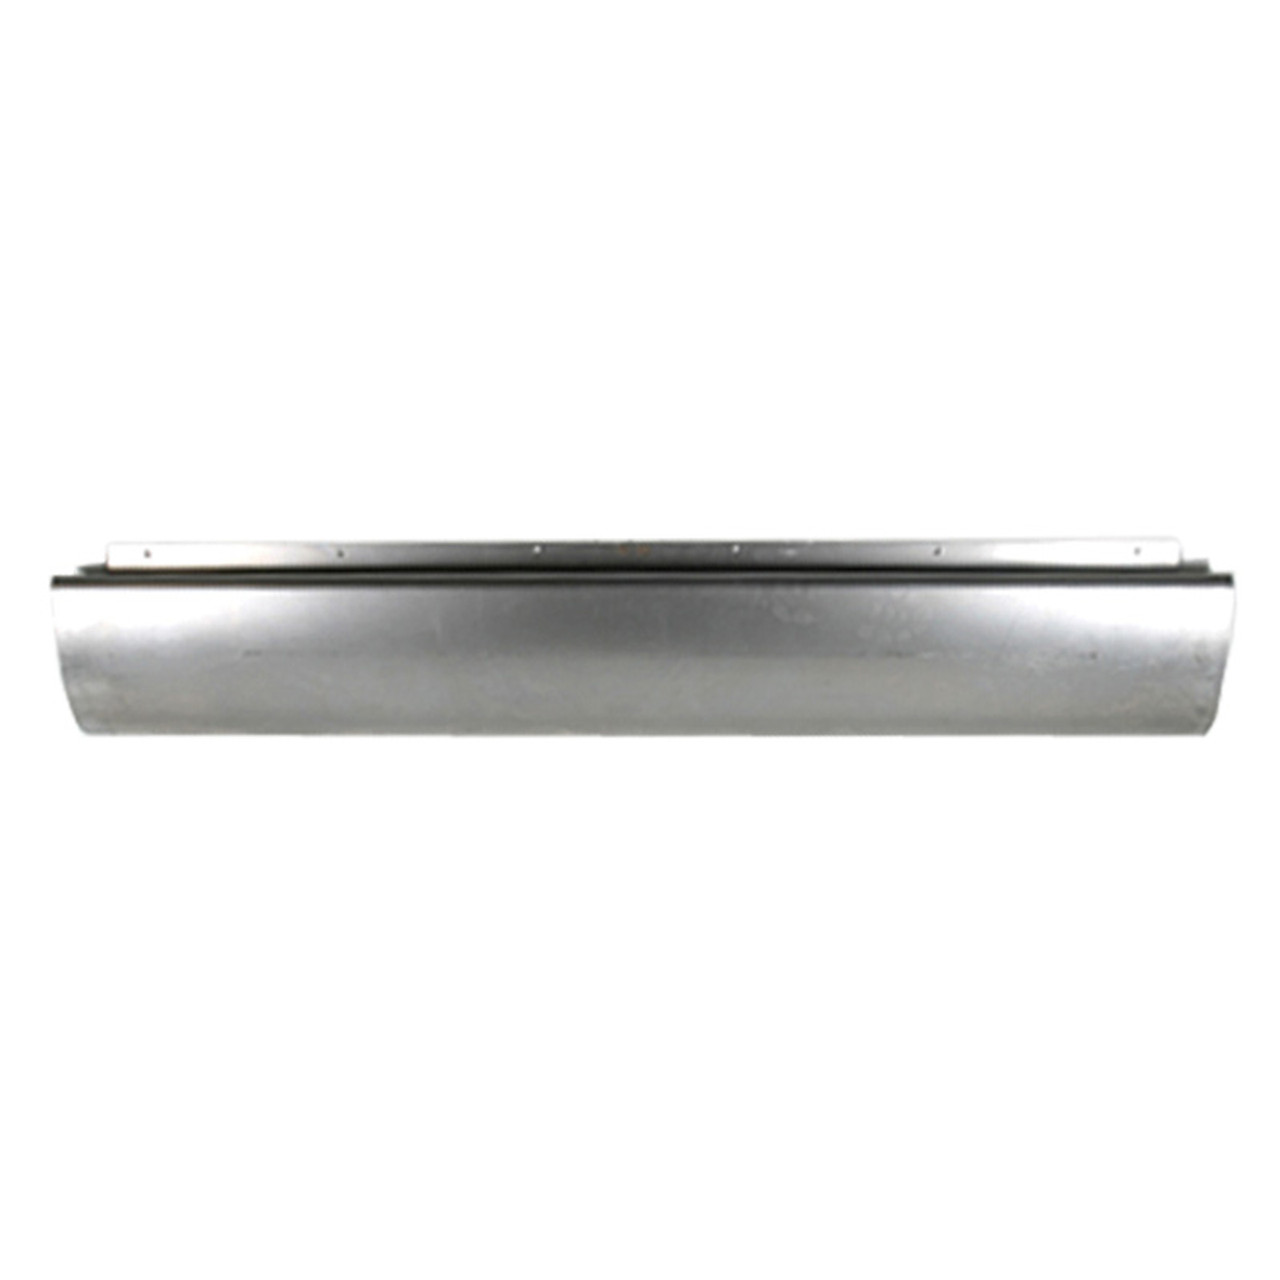 1997-2004 DODGE DAKOTA  Steel Rollpan Smooth Roll Pan